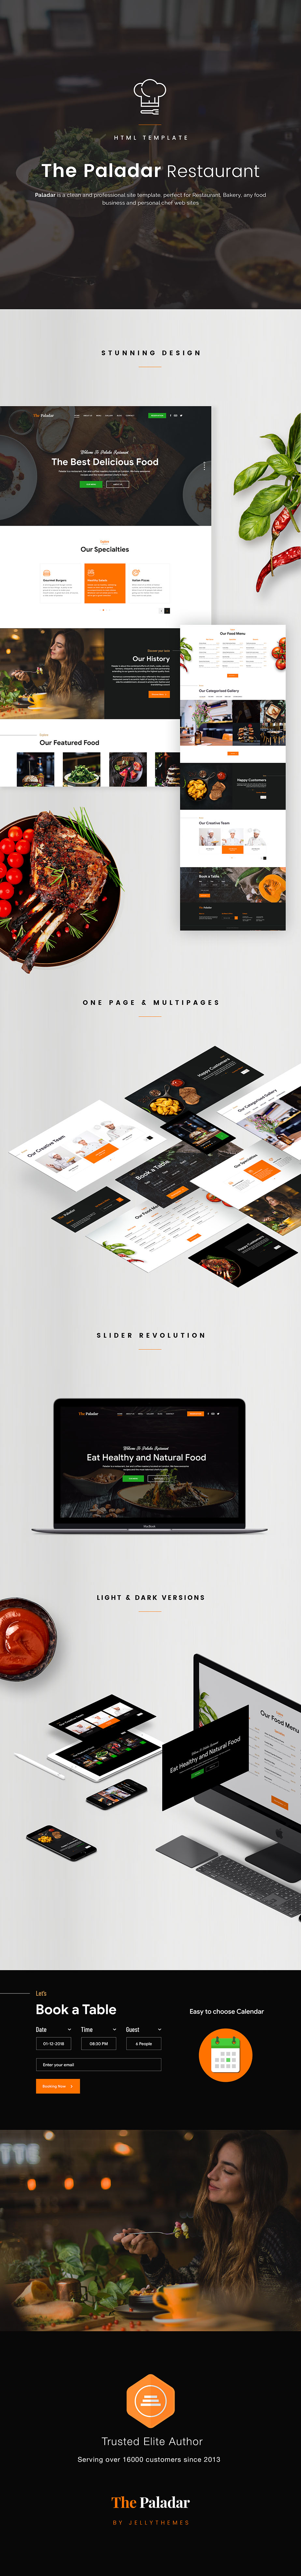 Paladar - HTML Restaurant Template - 1